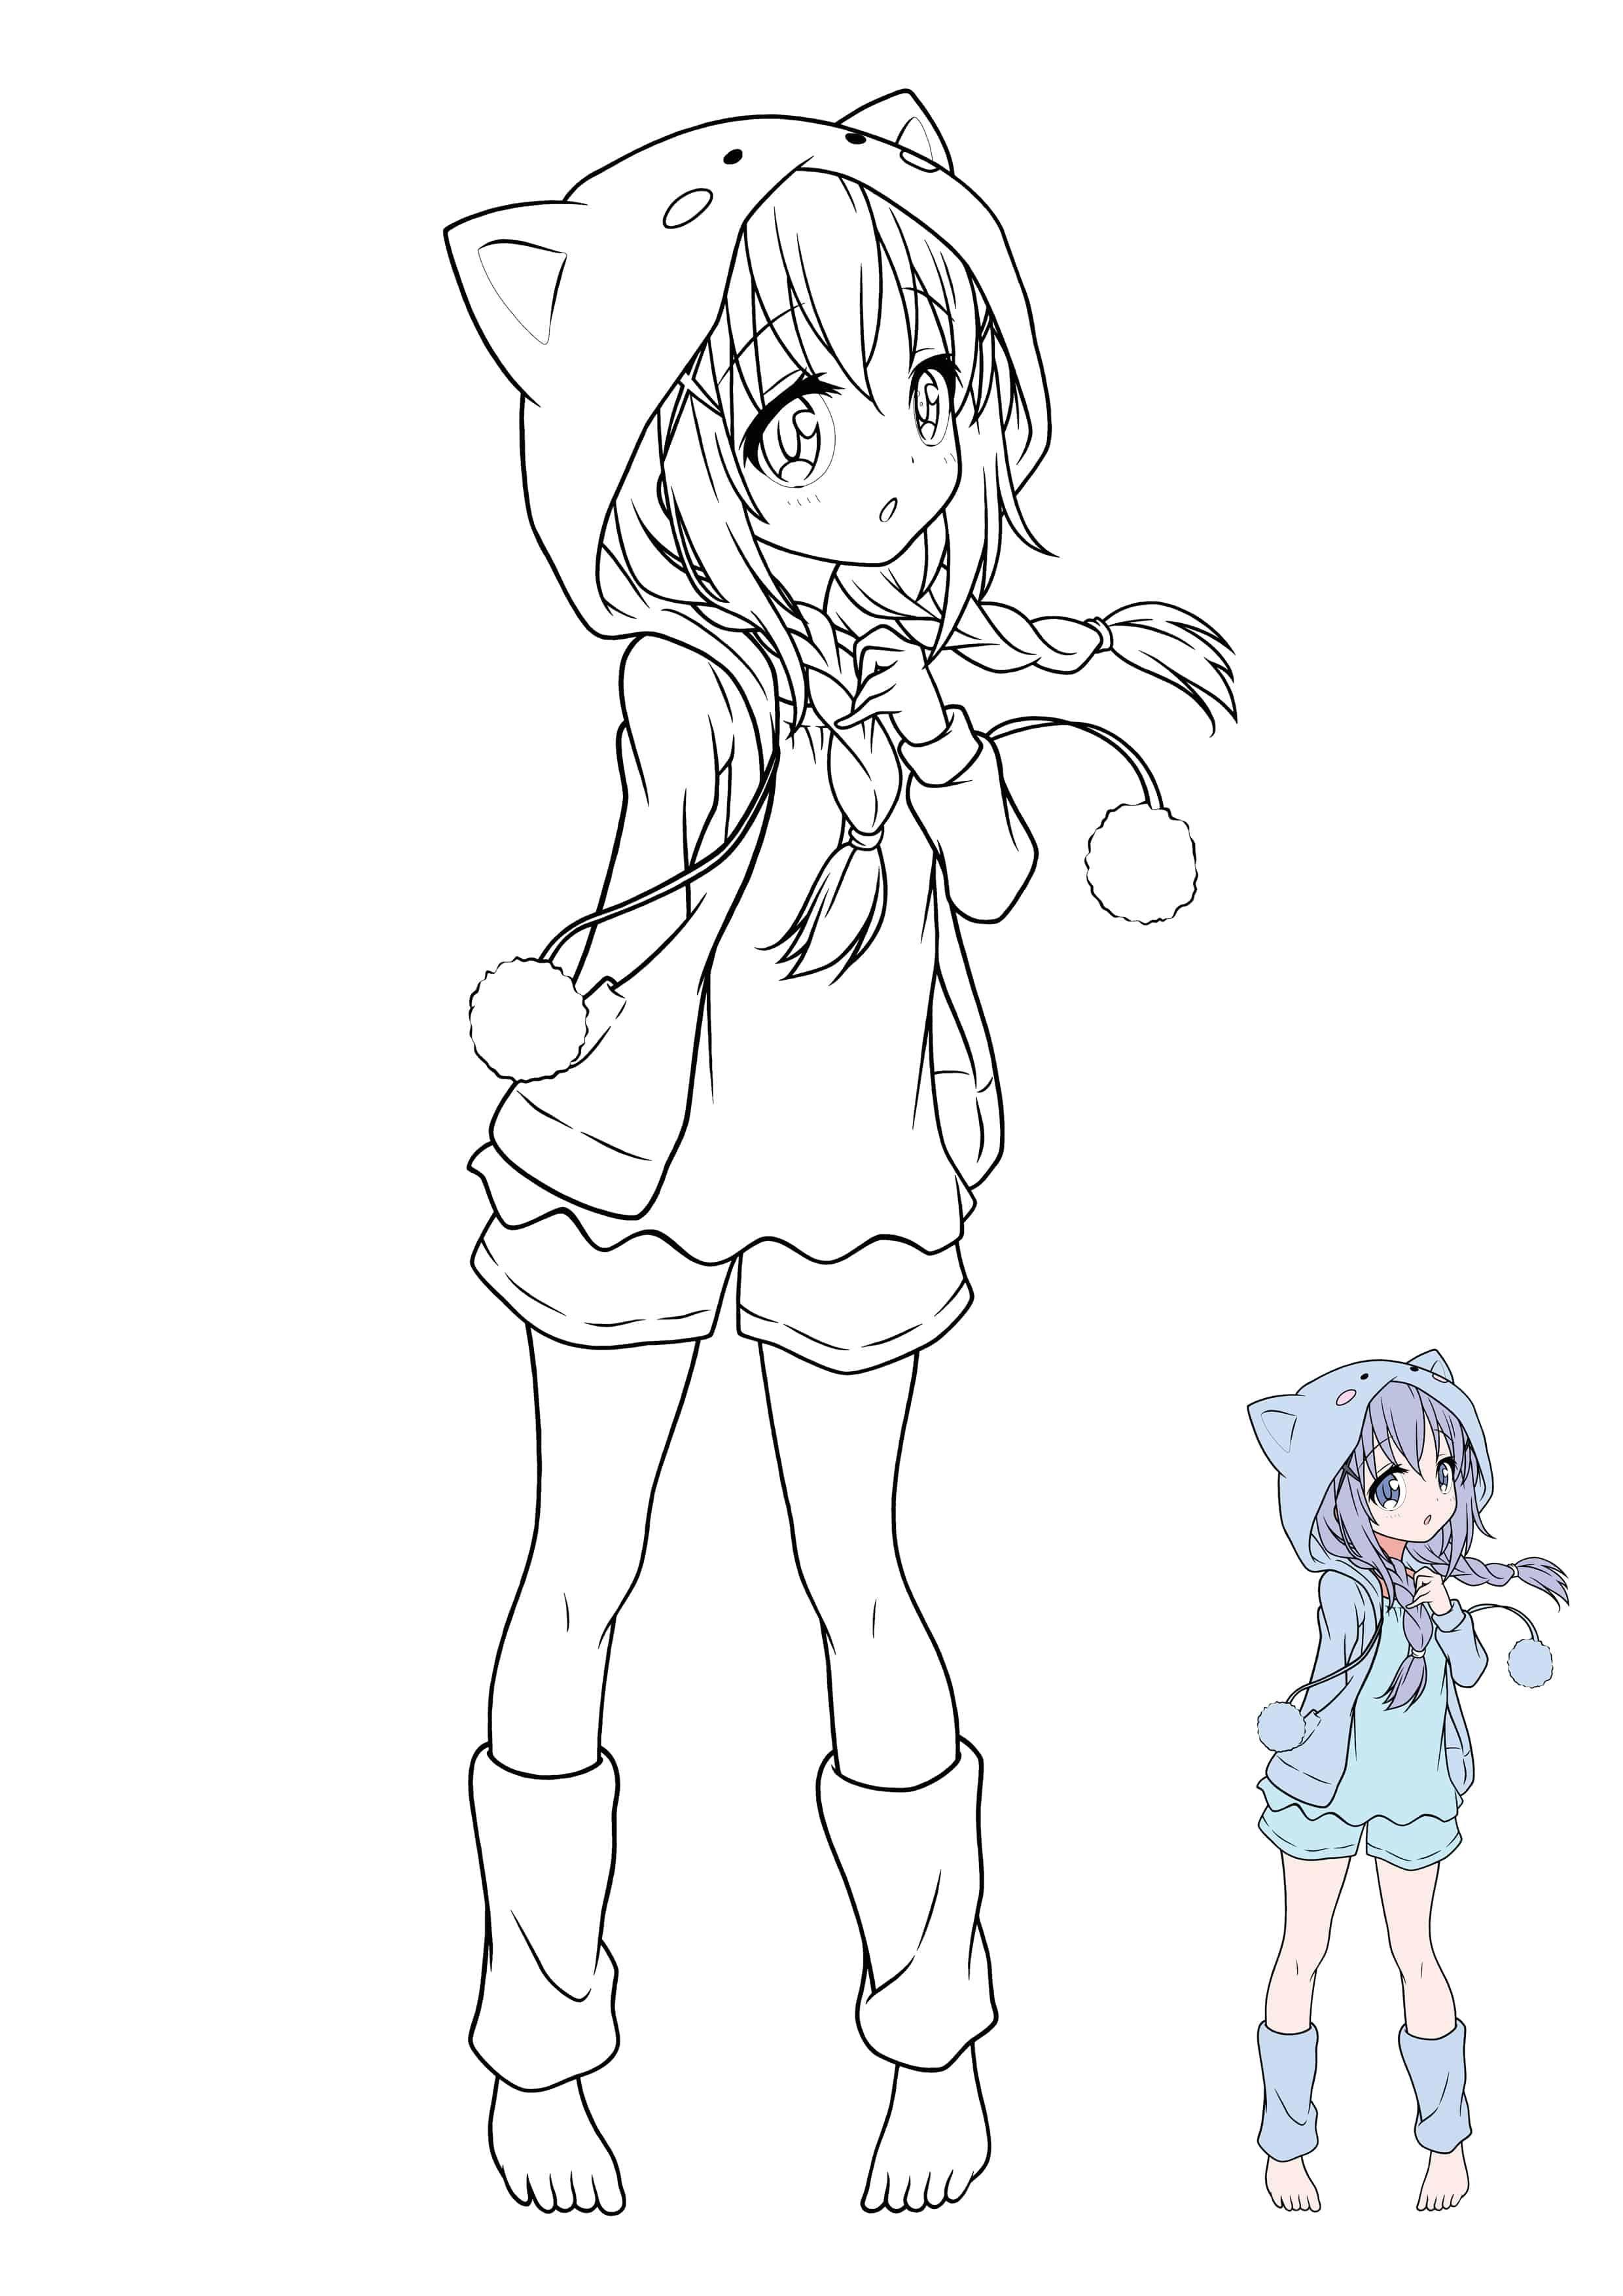 Kawaii Manga Girl coloring sheet  Manga coloring book, Chibi